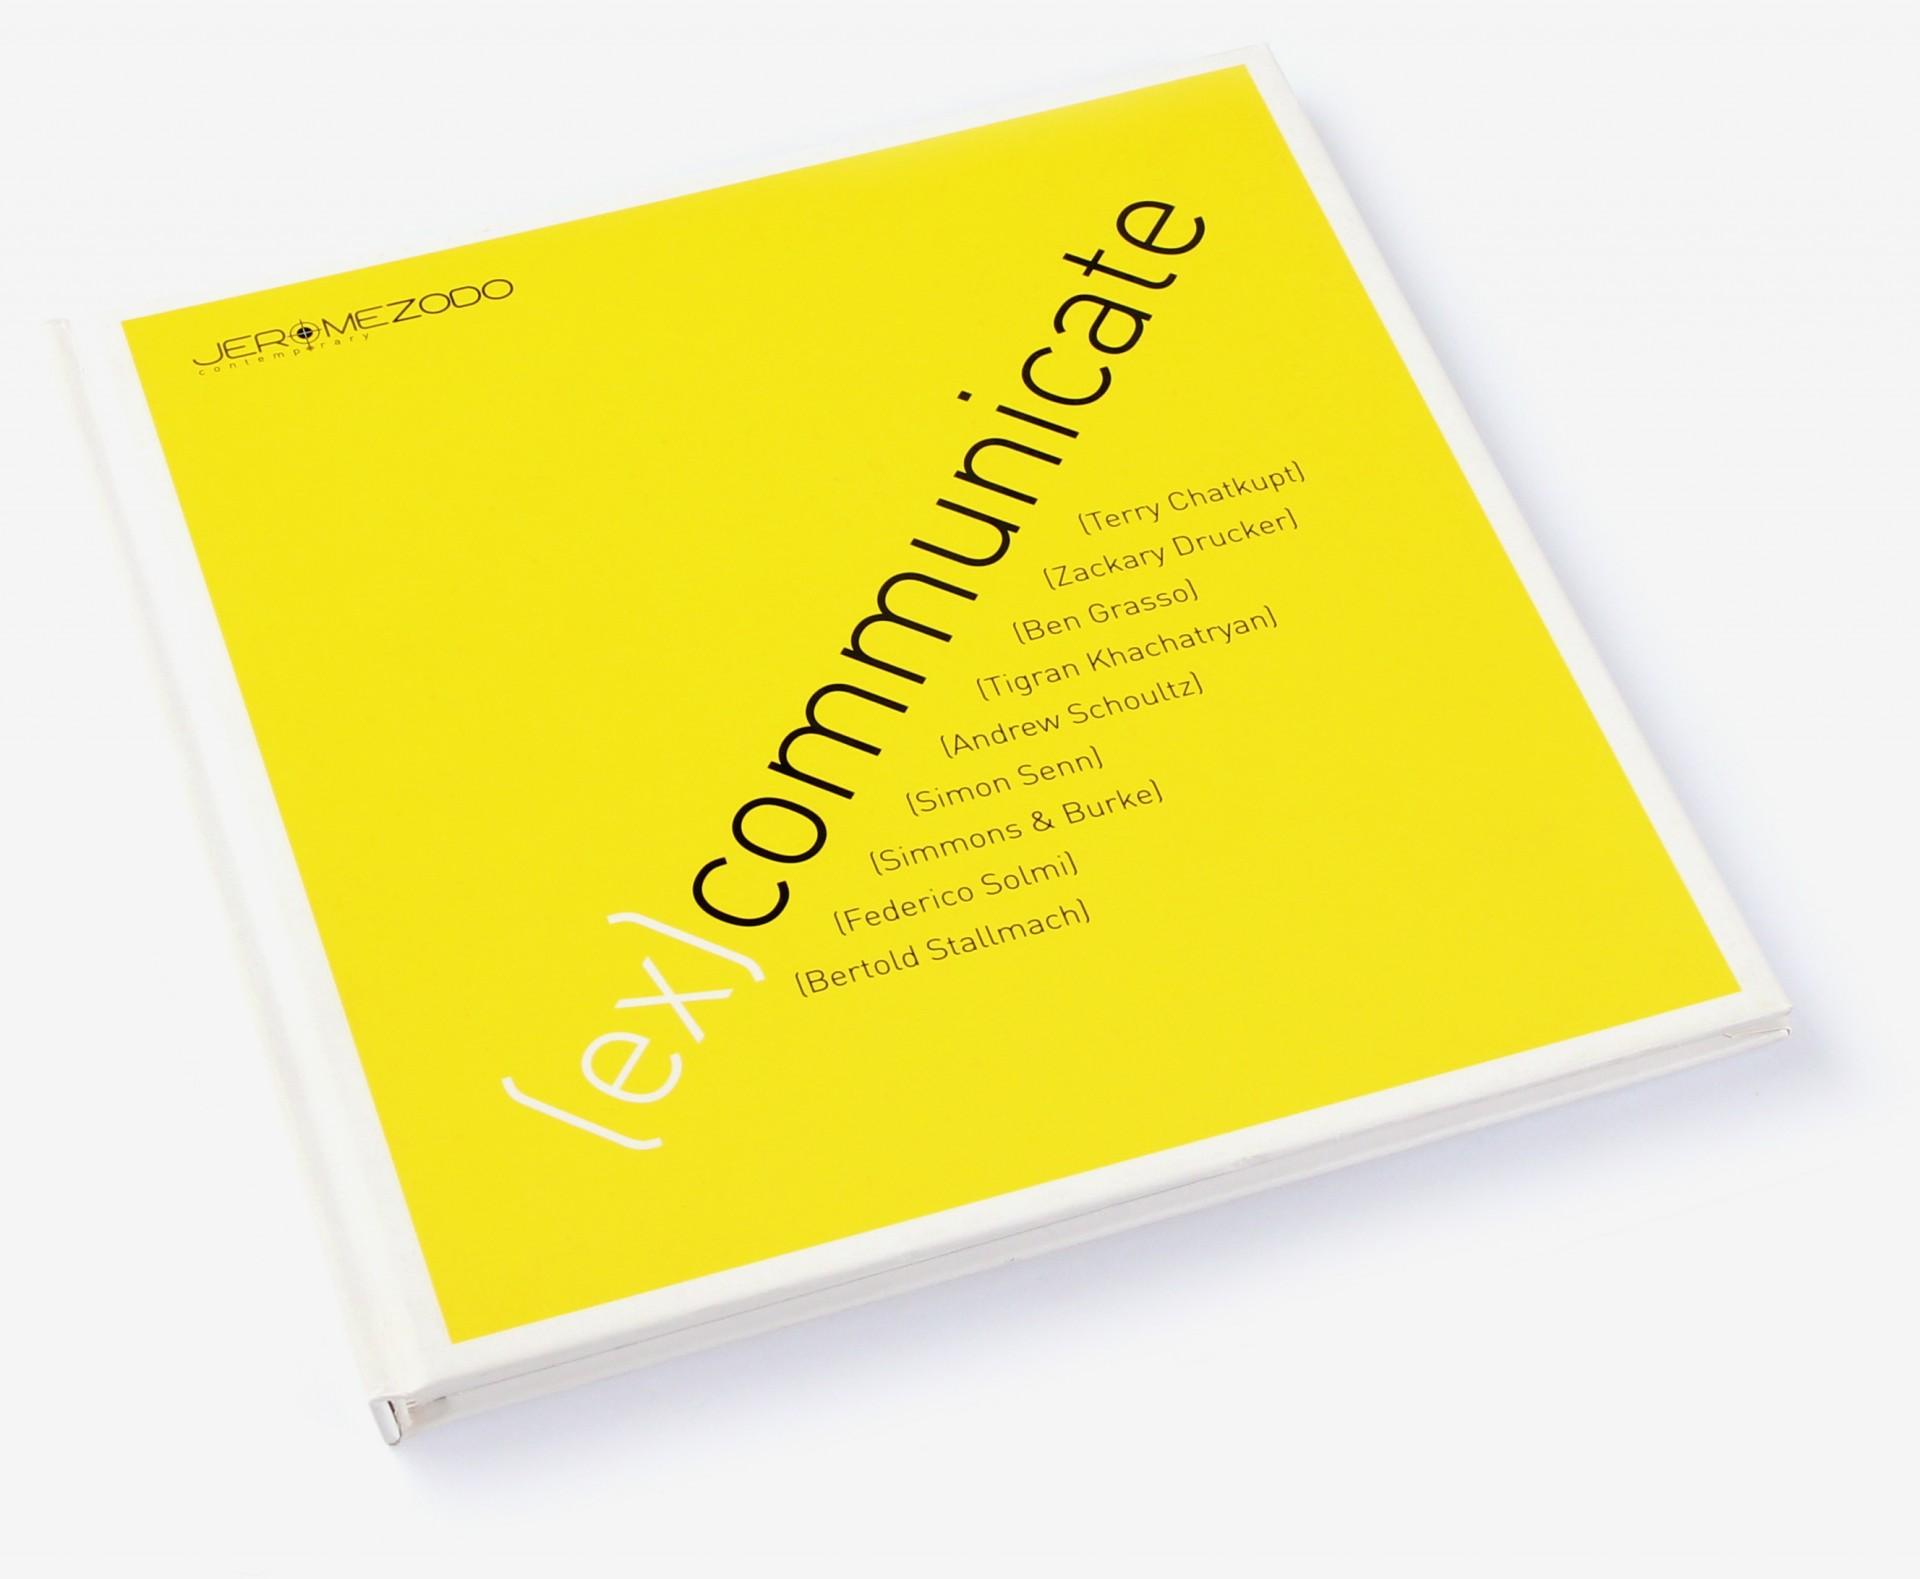 catalogo ex-communicate - copertina